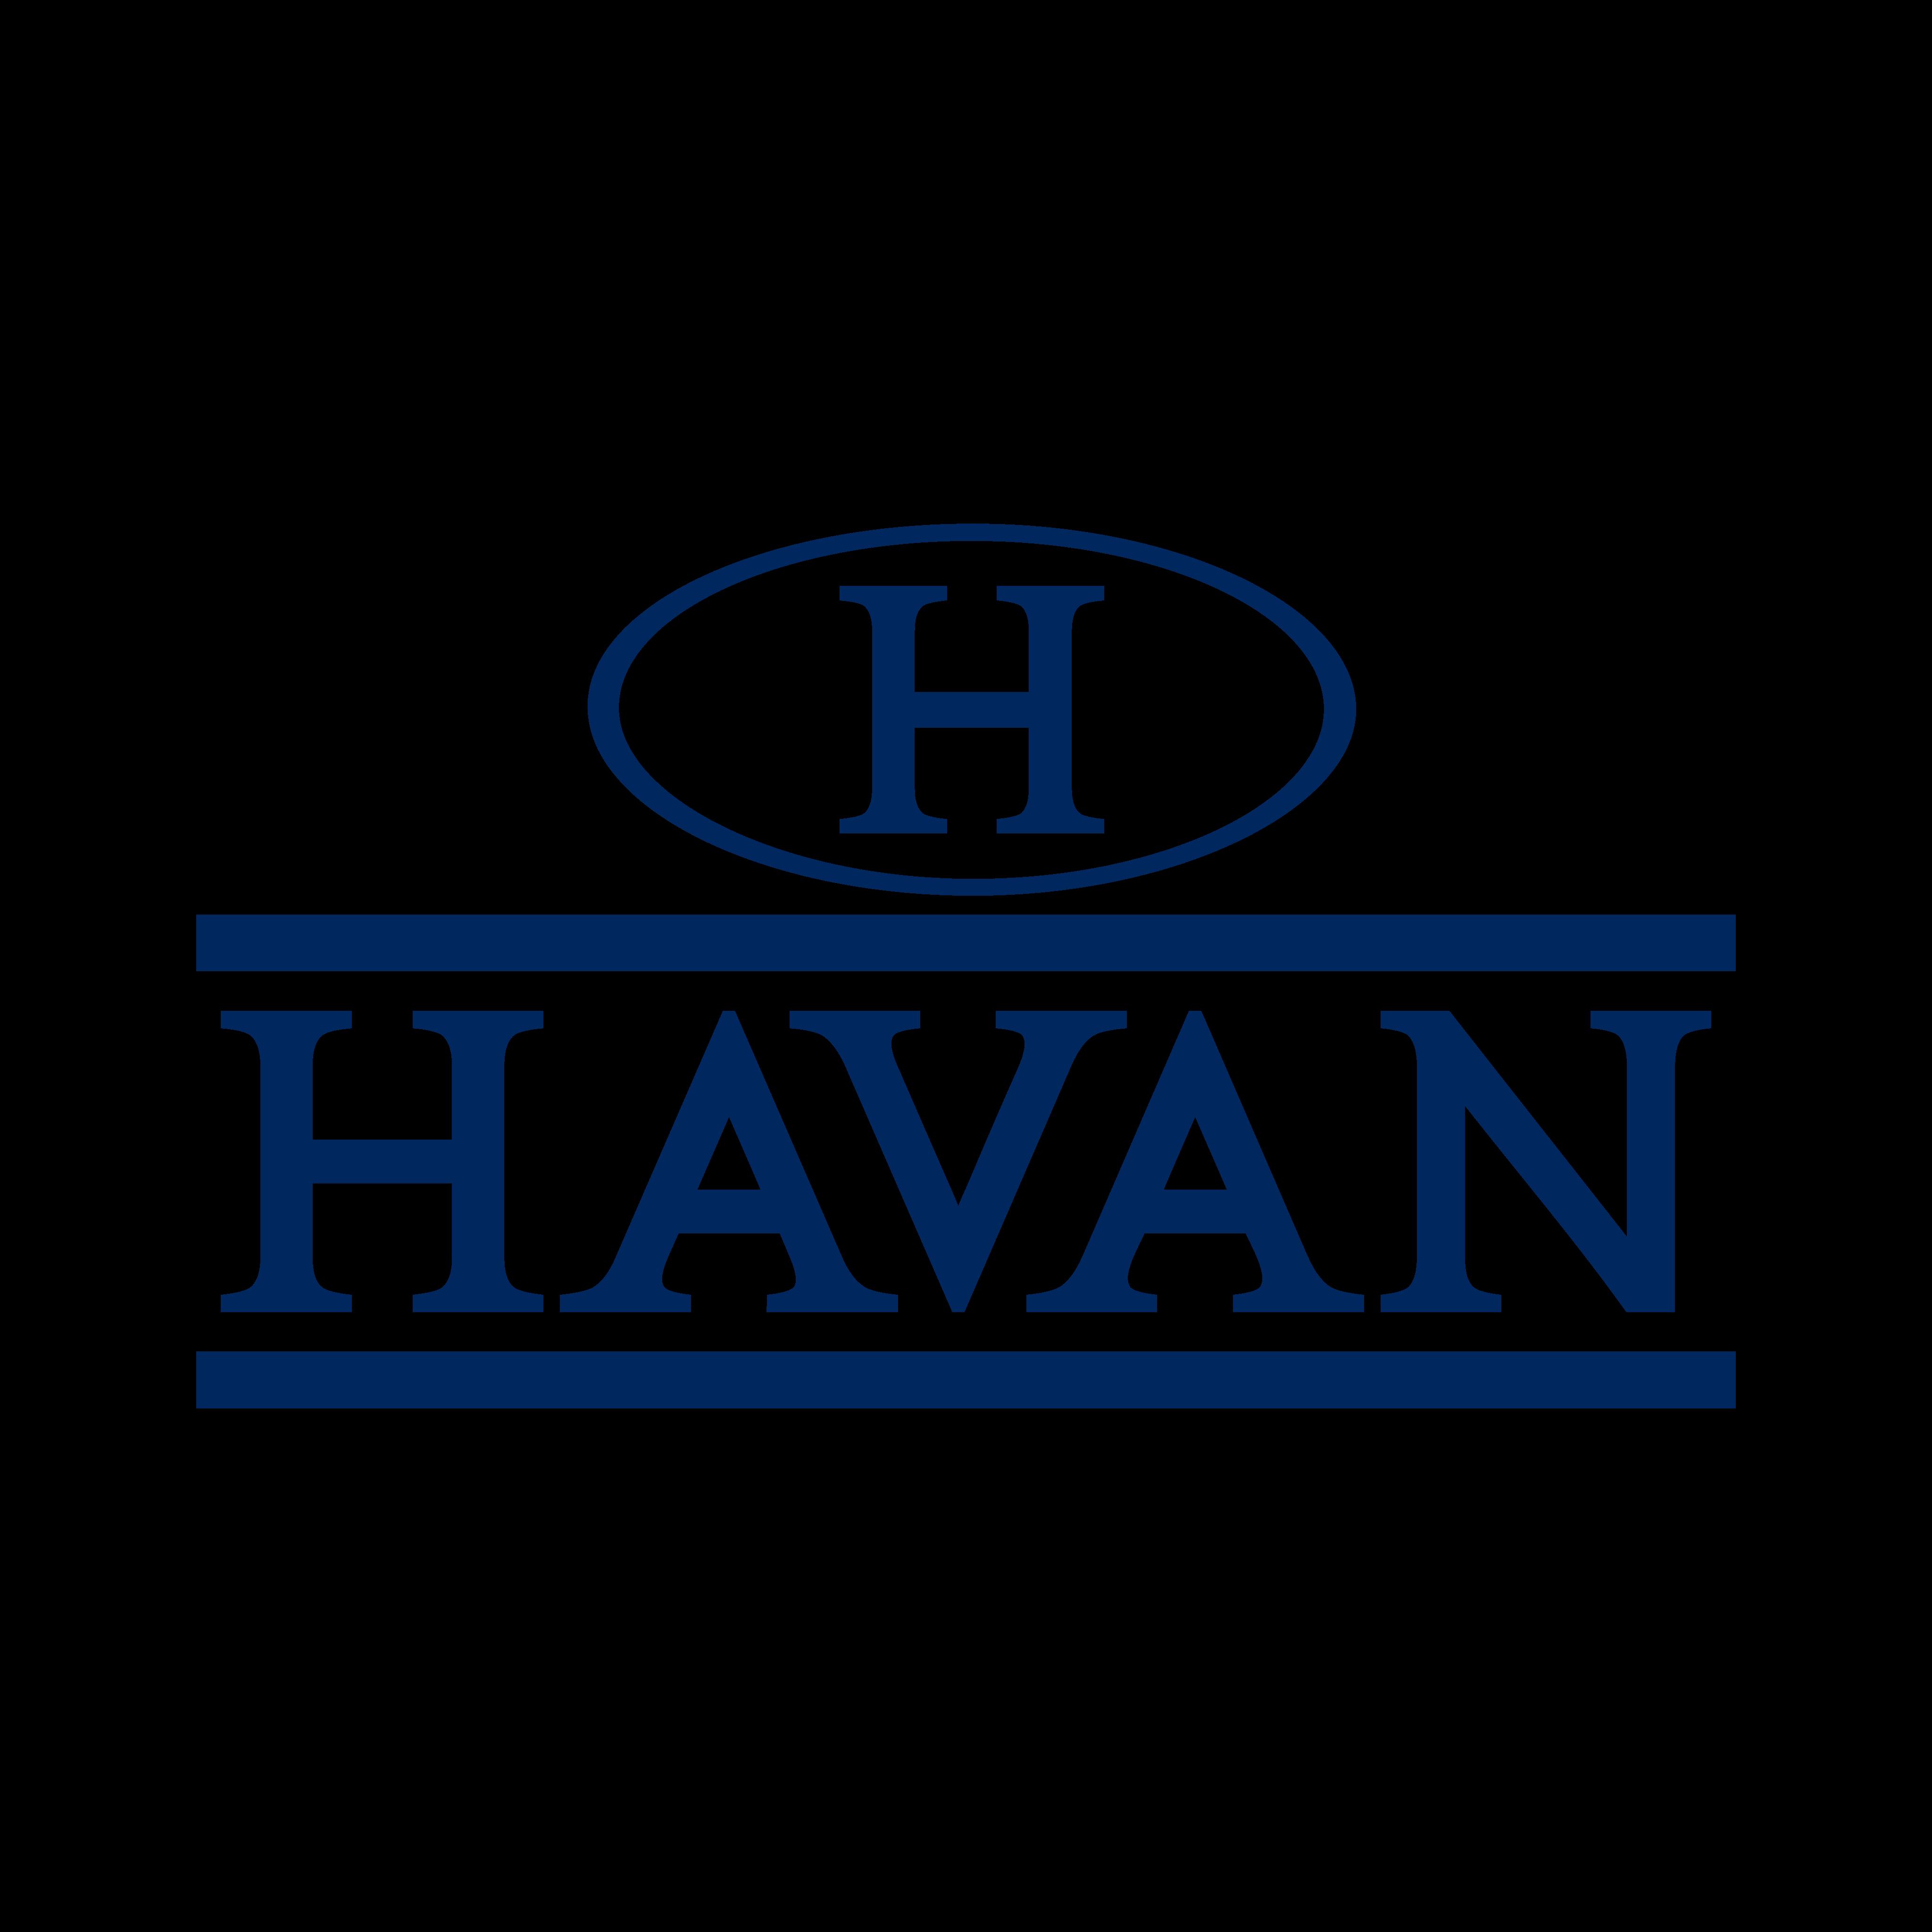 havan logo 0 - Havan Logo